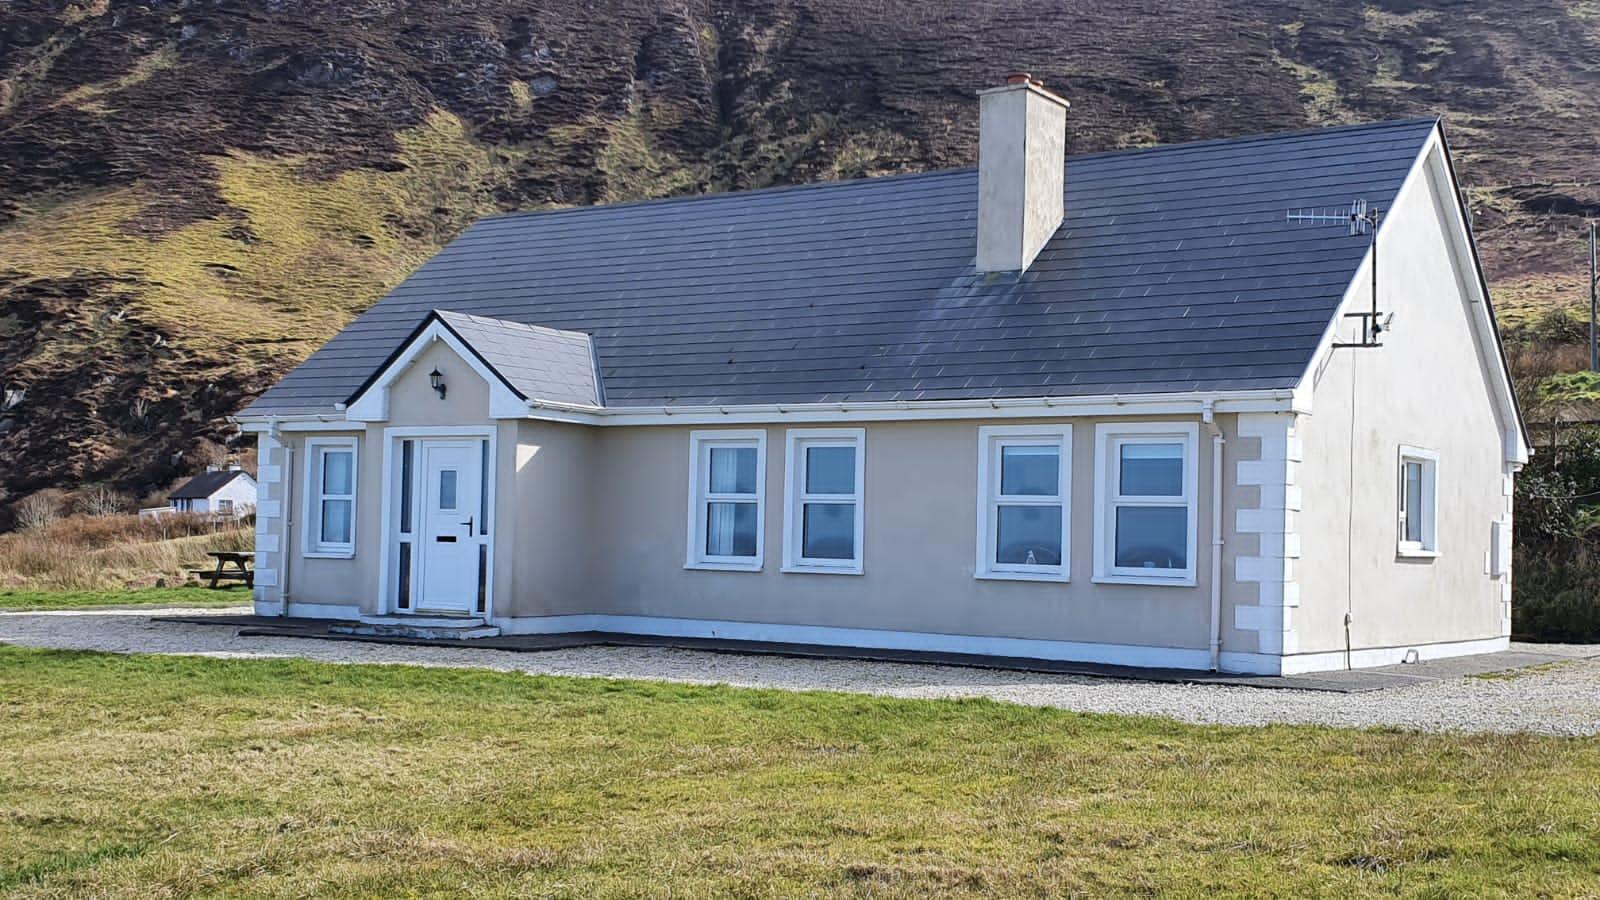 Meenalough, Brinaleck, Co. Donegal – 3 Bedroom Bungalow.